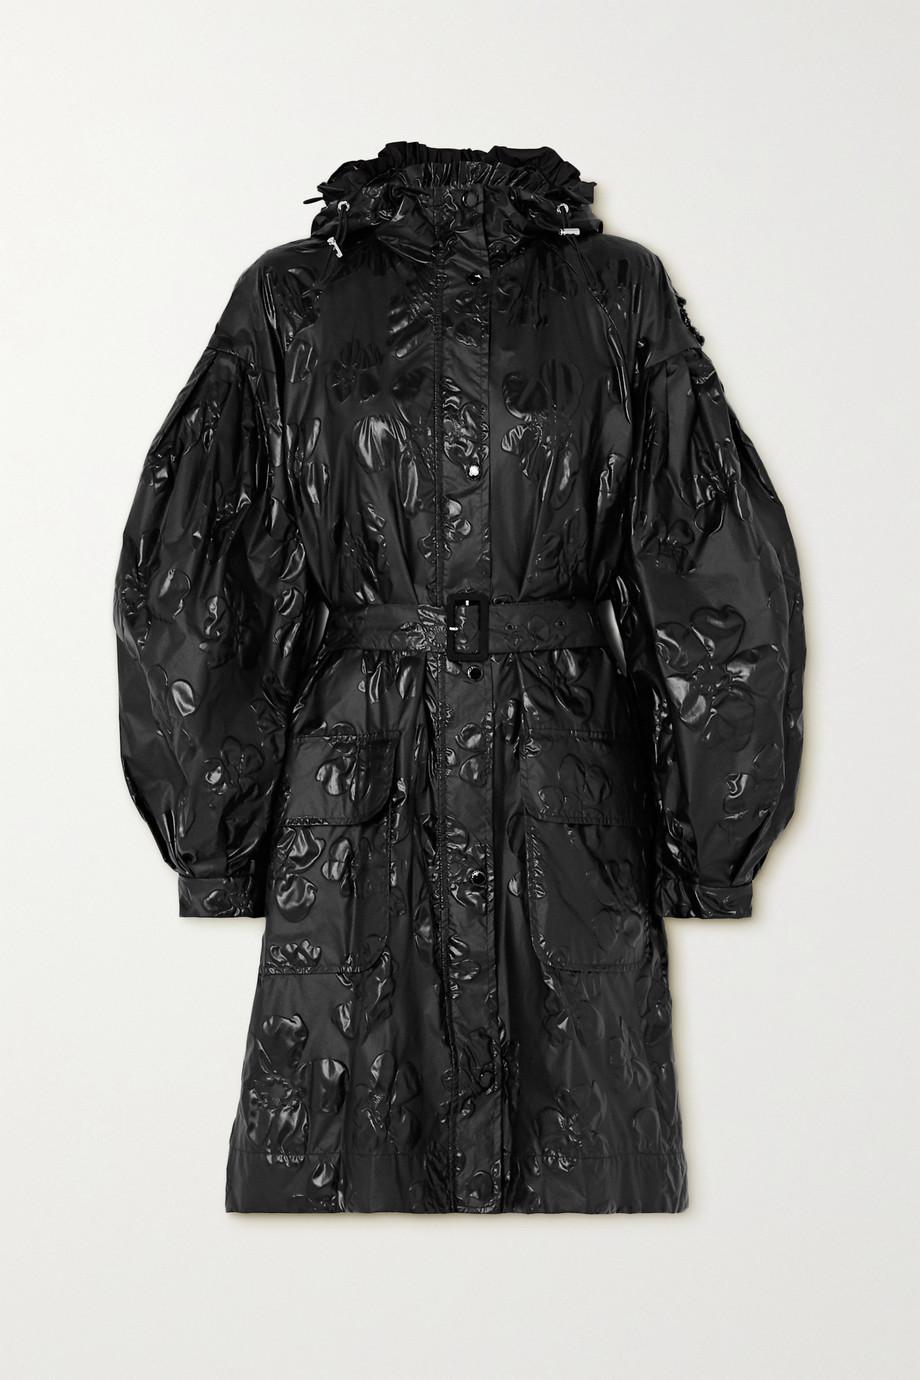 Moncler Genius + 4 Simone Rocha Rapahelis belted floral-jacquard shell coat